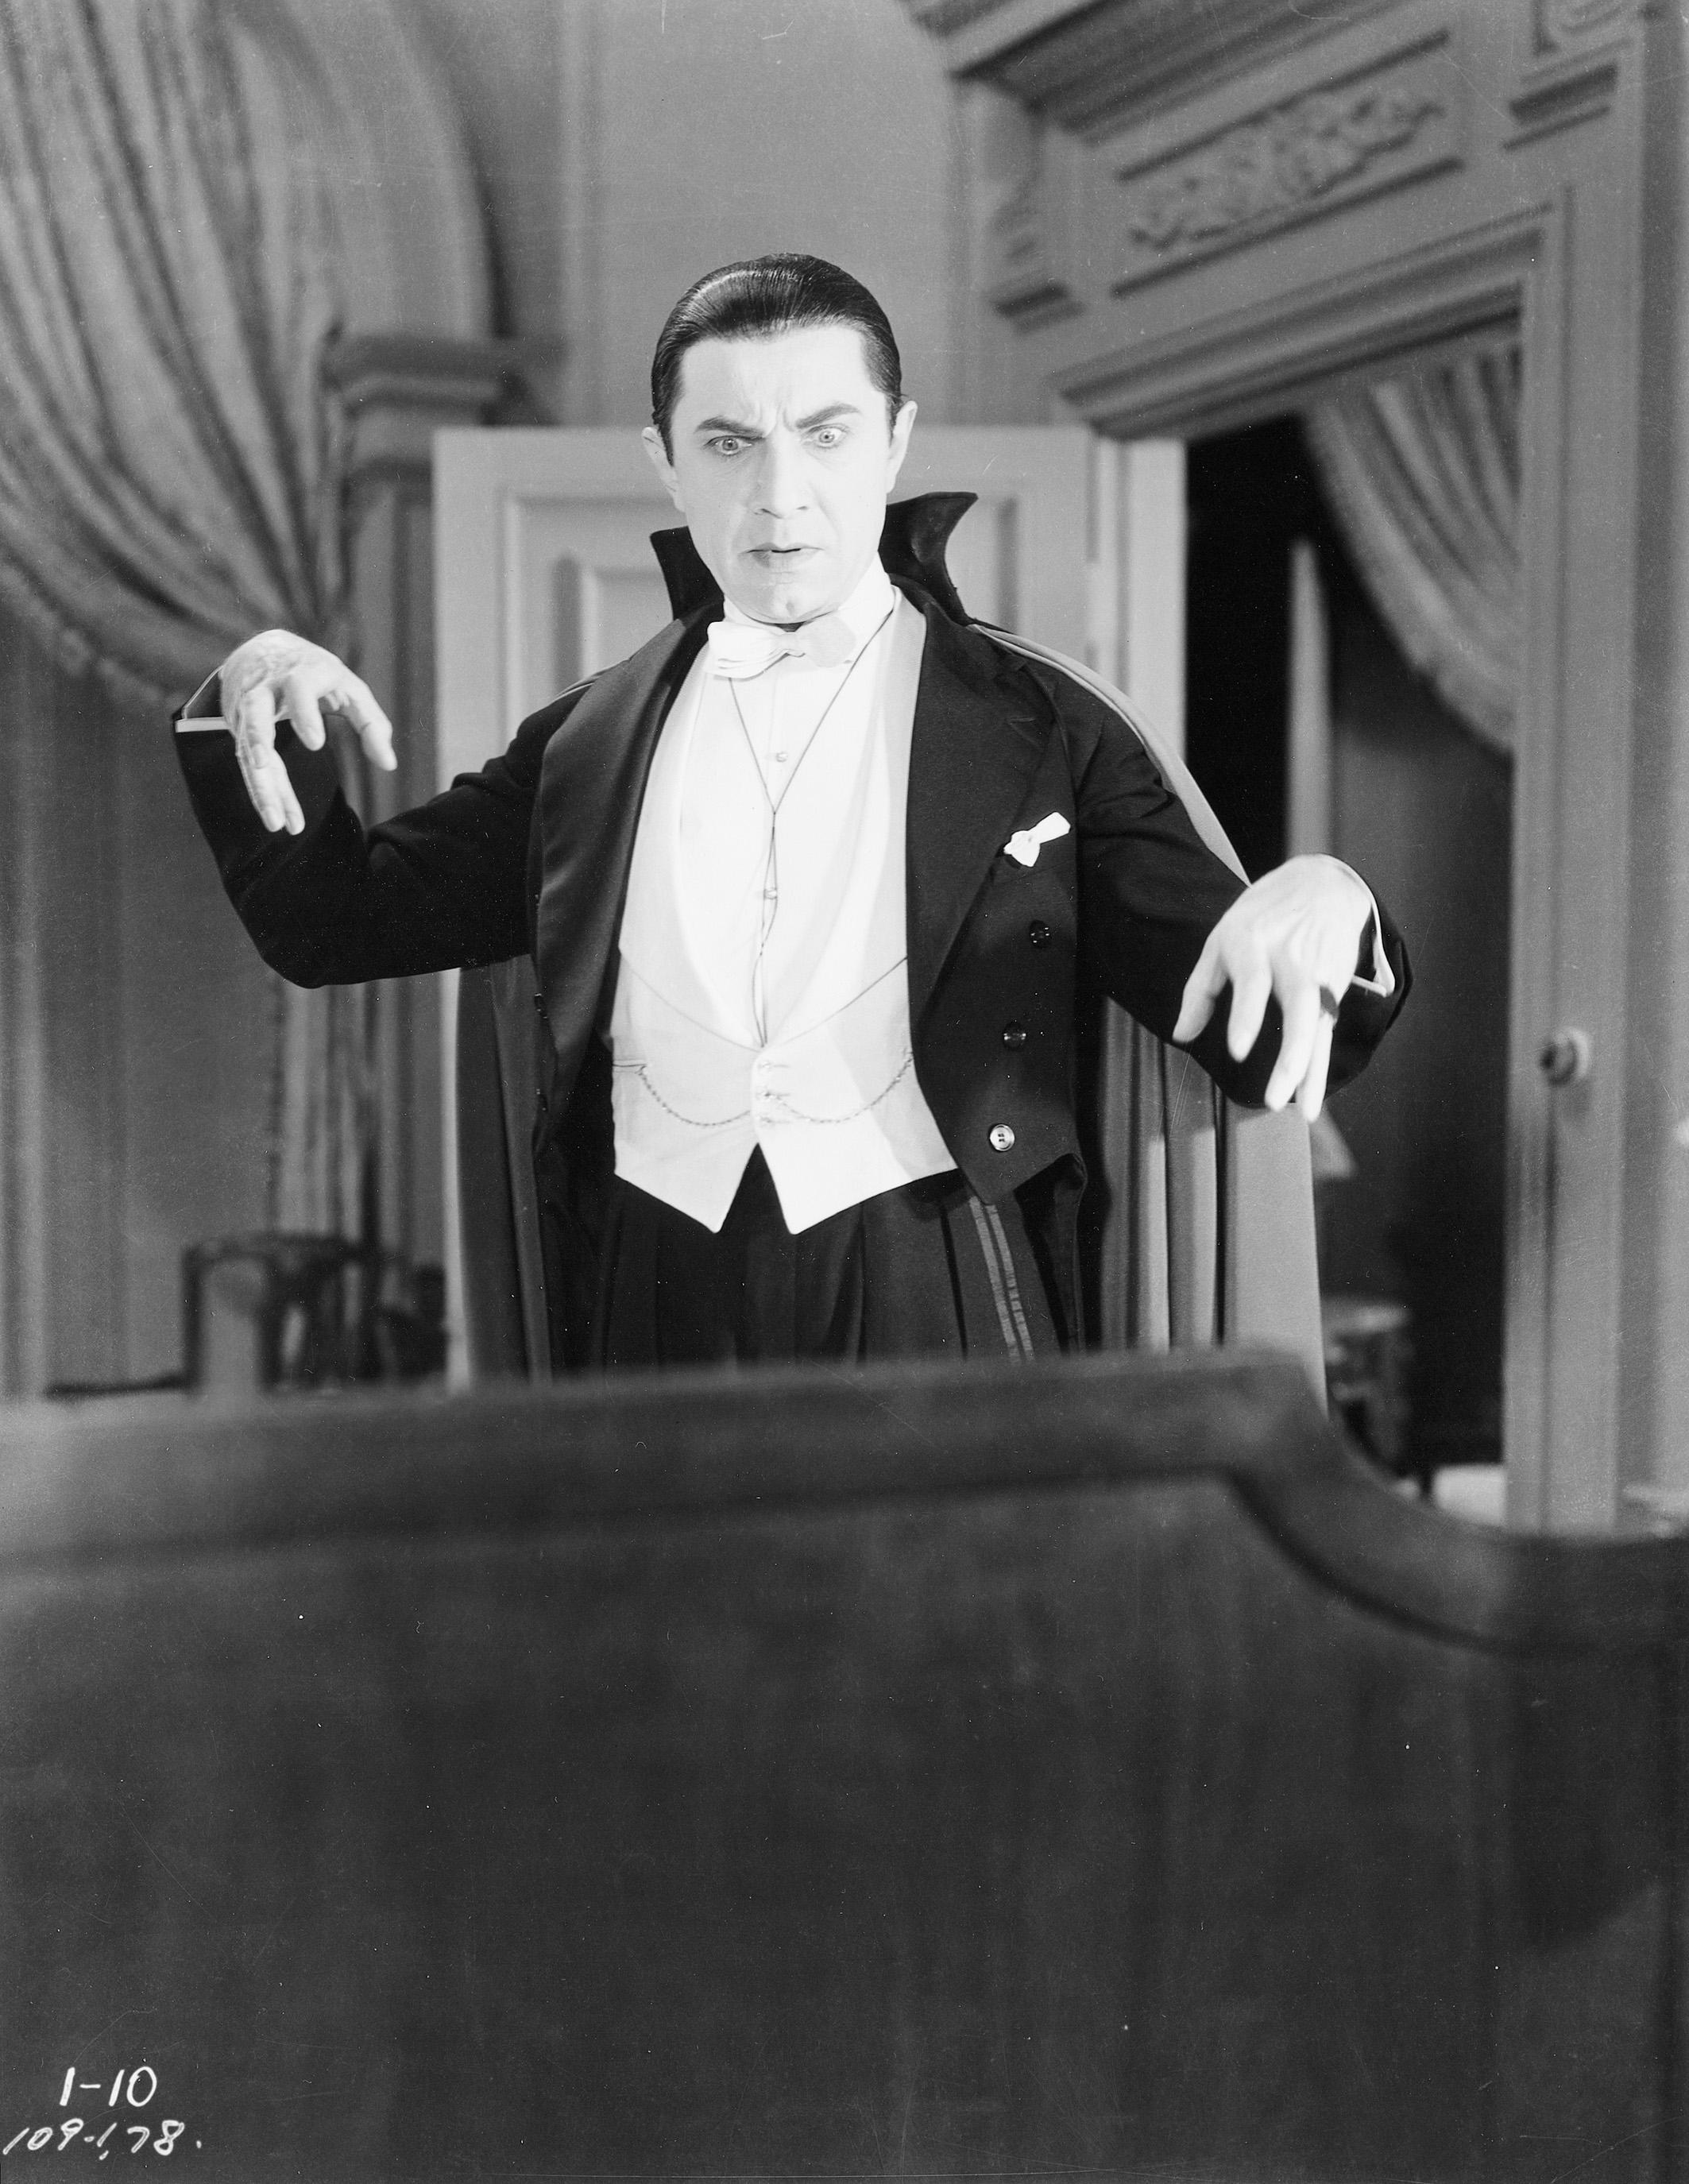 Bela Lugosi ist Dracula – Der Vampir in Schwarzweiß